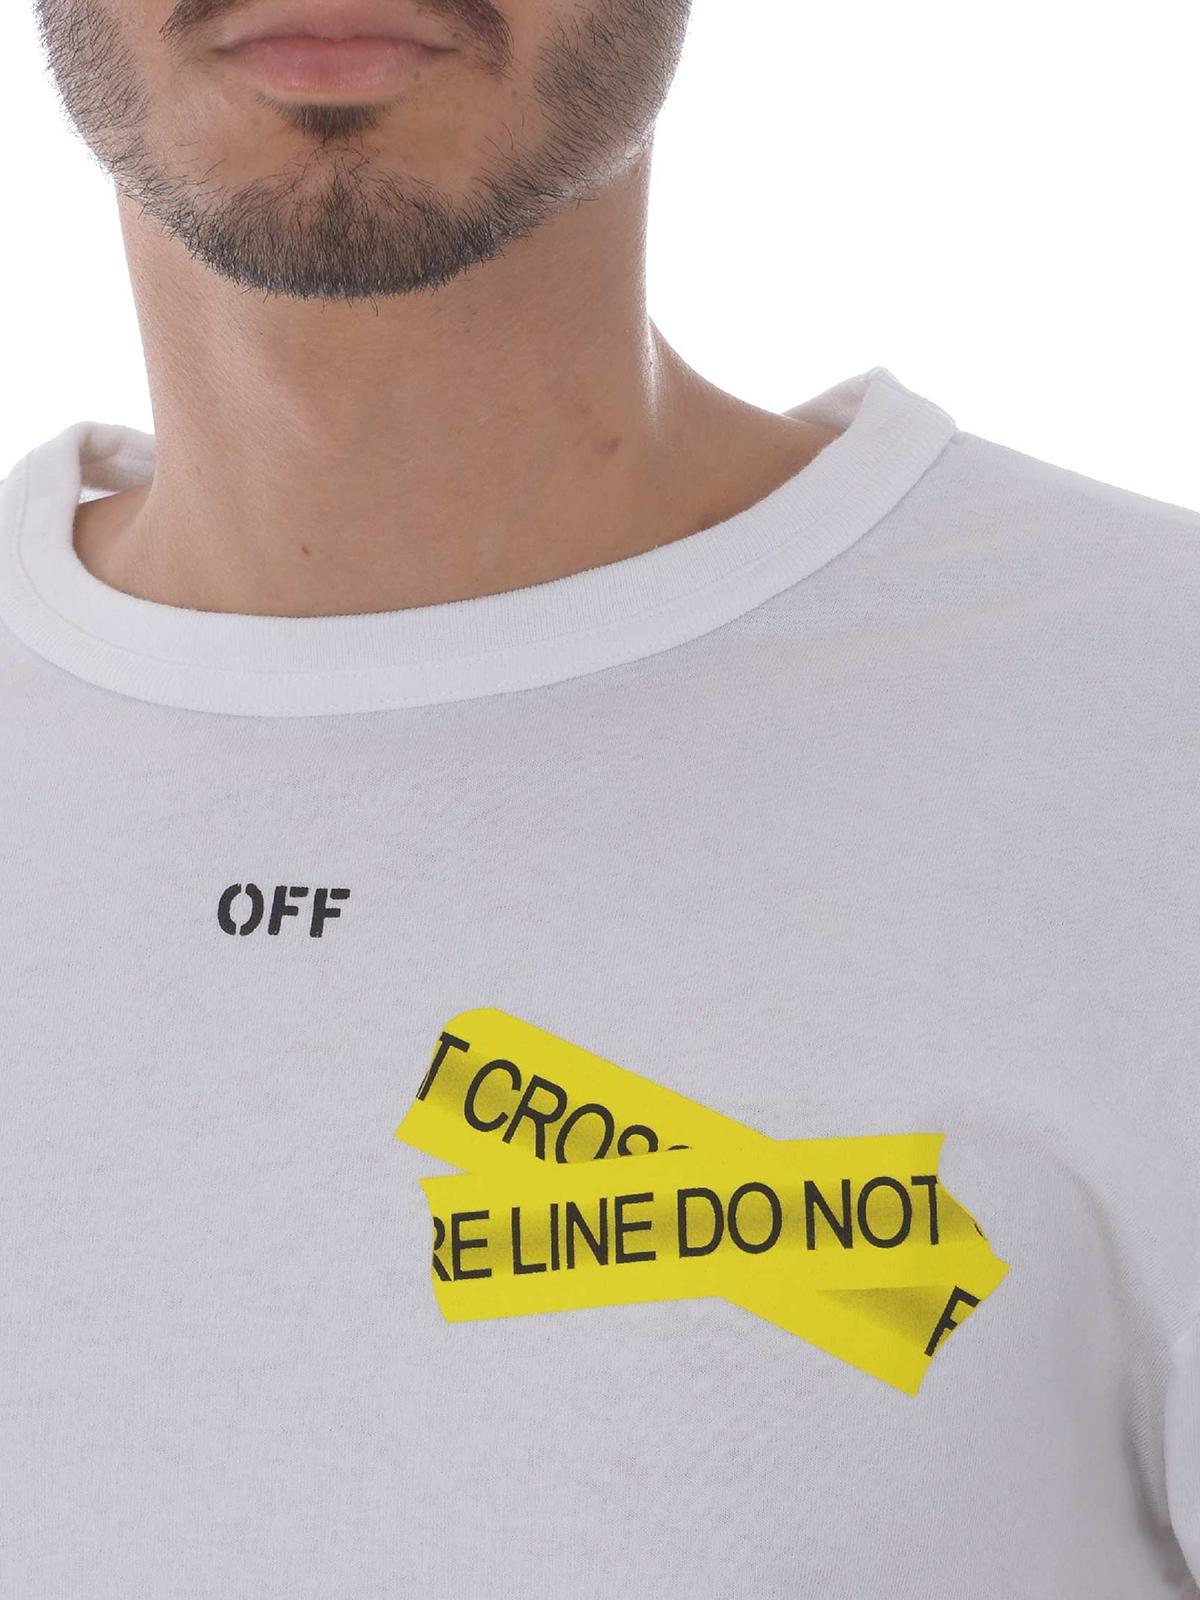 Off-White - Firetape white T-shirt - t-shirts - OMAA002S181850060160 451deec7c0a8